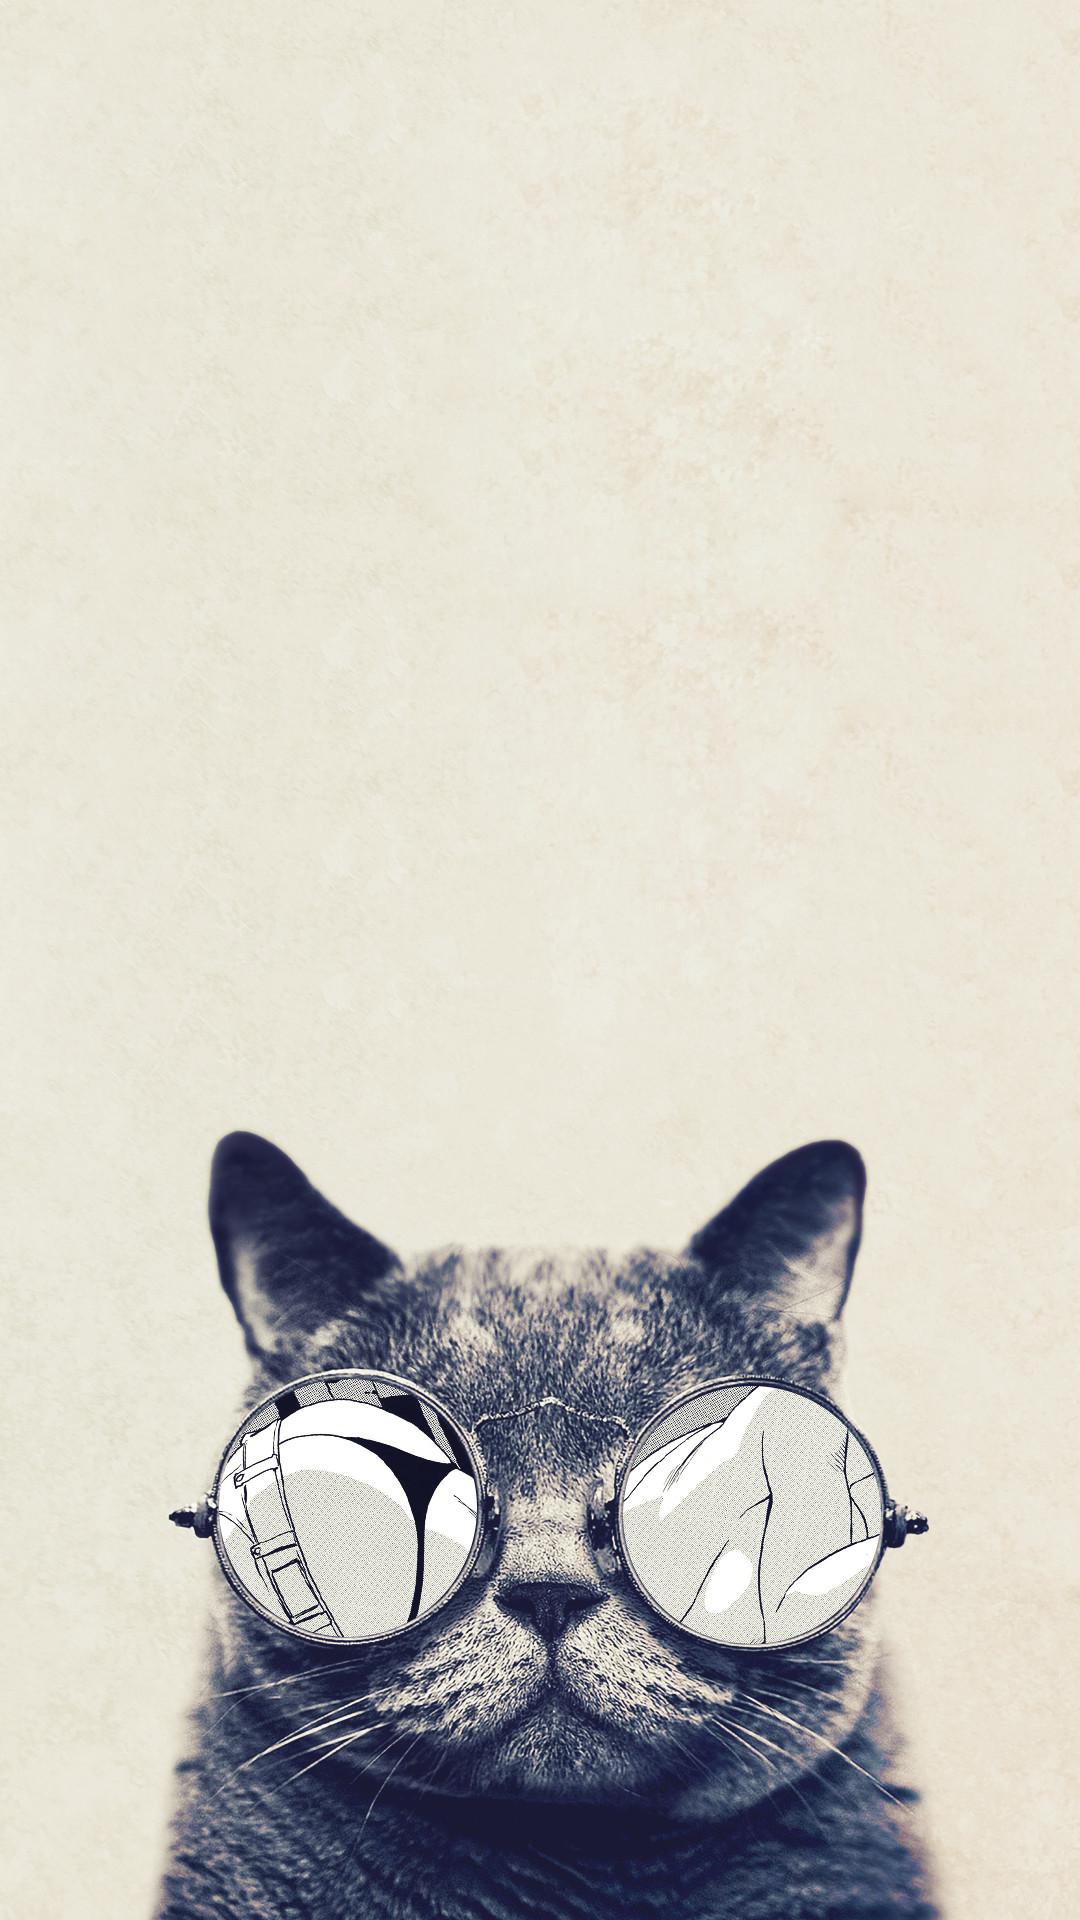 Cool Cat Glasses Android Wallpaper.jpg 1,080×1,920 pixels 1080x1920